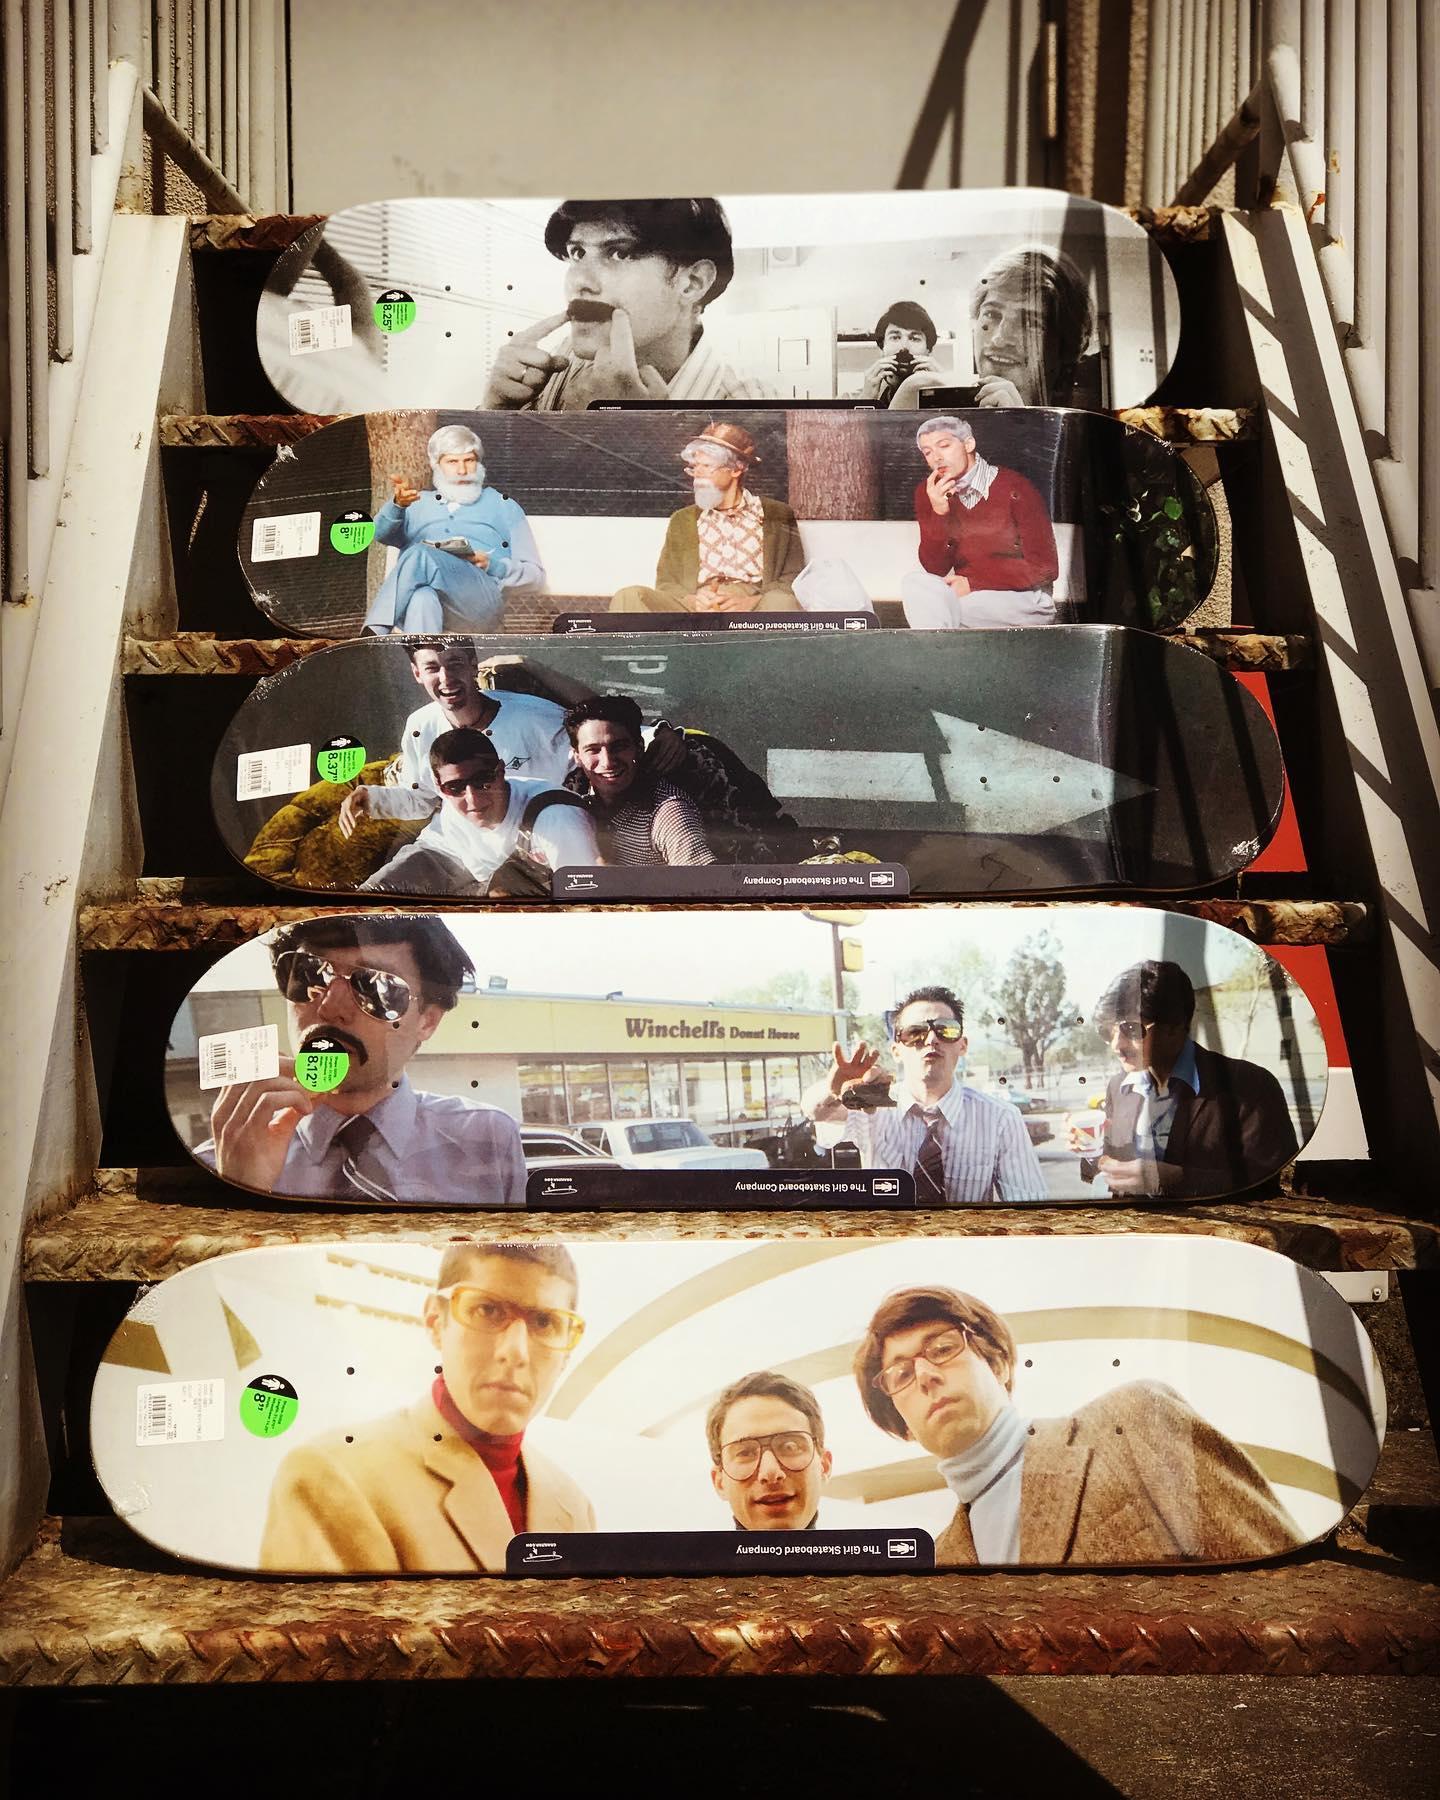 @girlskateboards  The new Beastie Boys Spike Jonze collection SIZE:上から8.25&8.5/8&8.25/8.37&9/8.12&8.37/8&8.5inch#GirlSkateboards#BeastieBoysStory@beastieboysstory#SpikeJonze